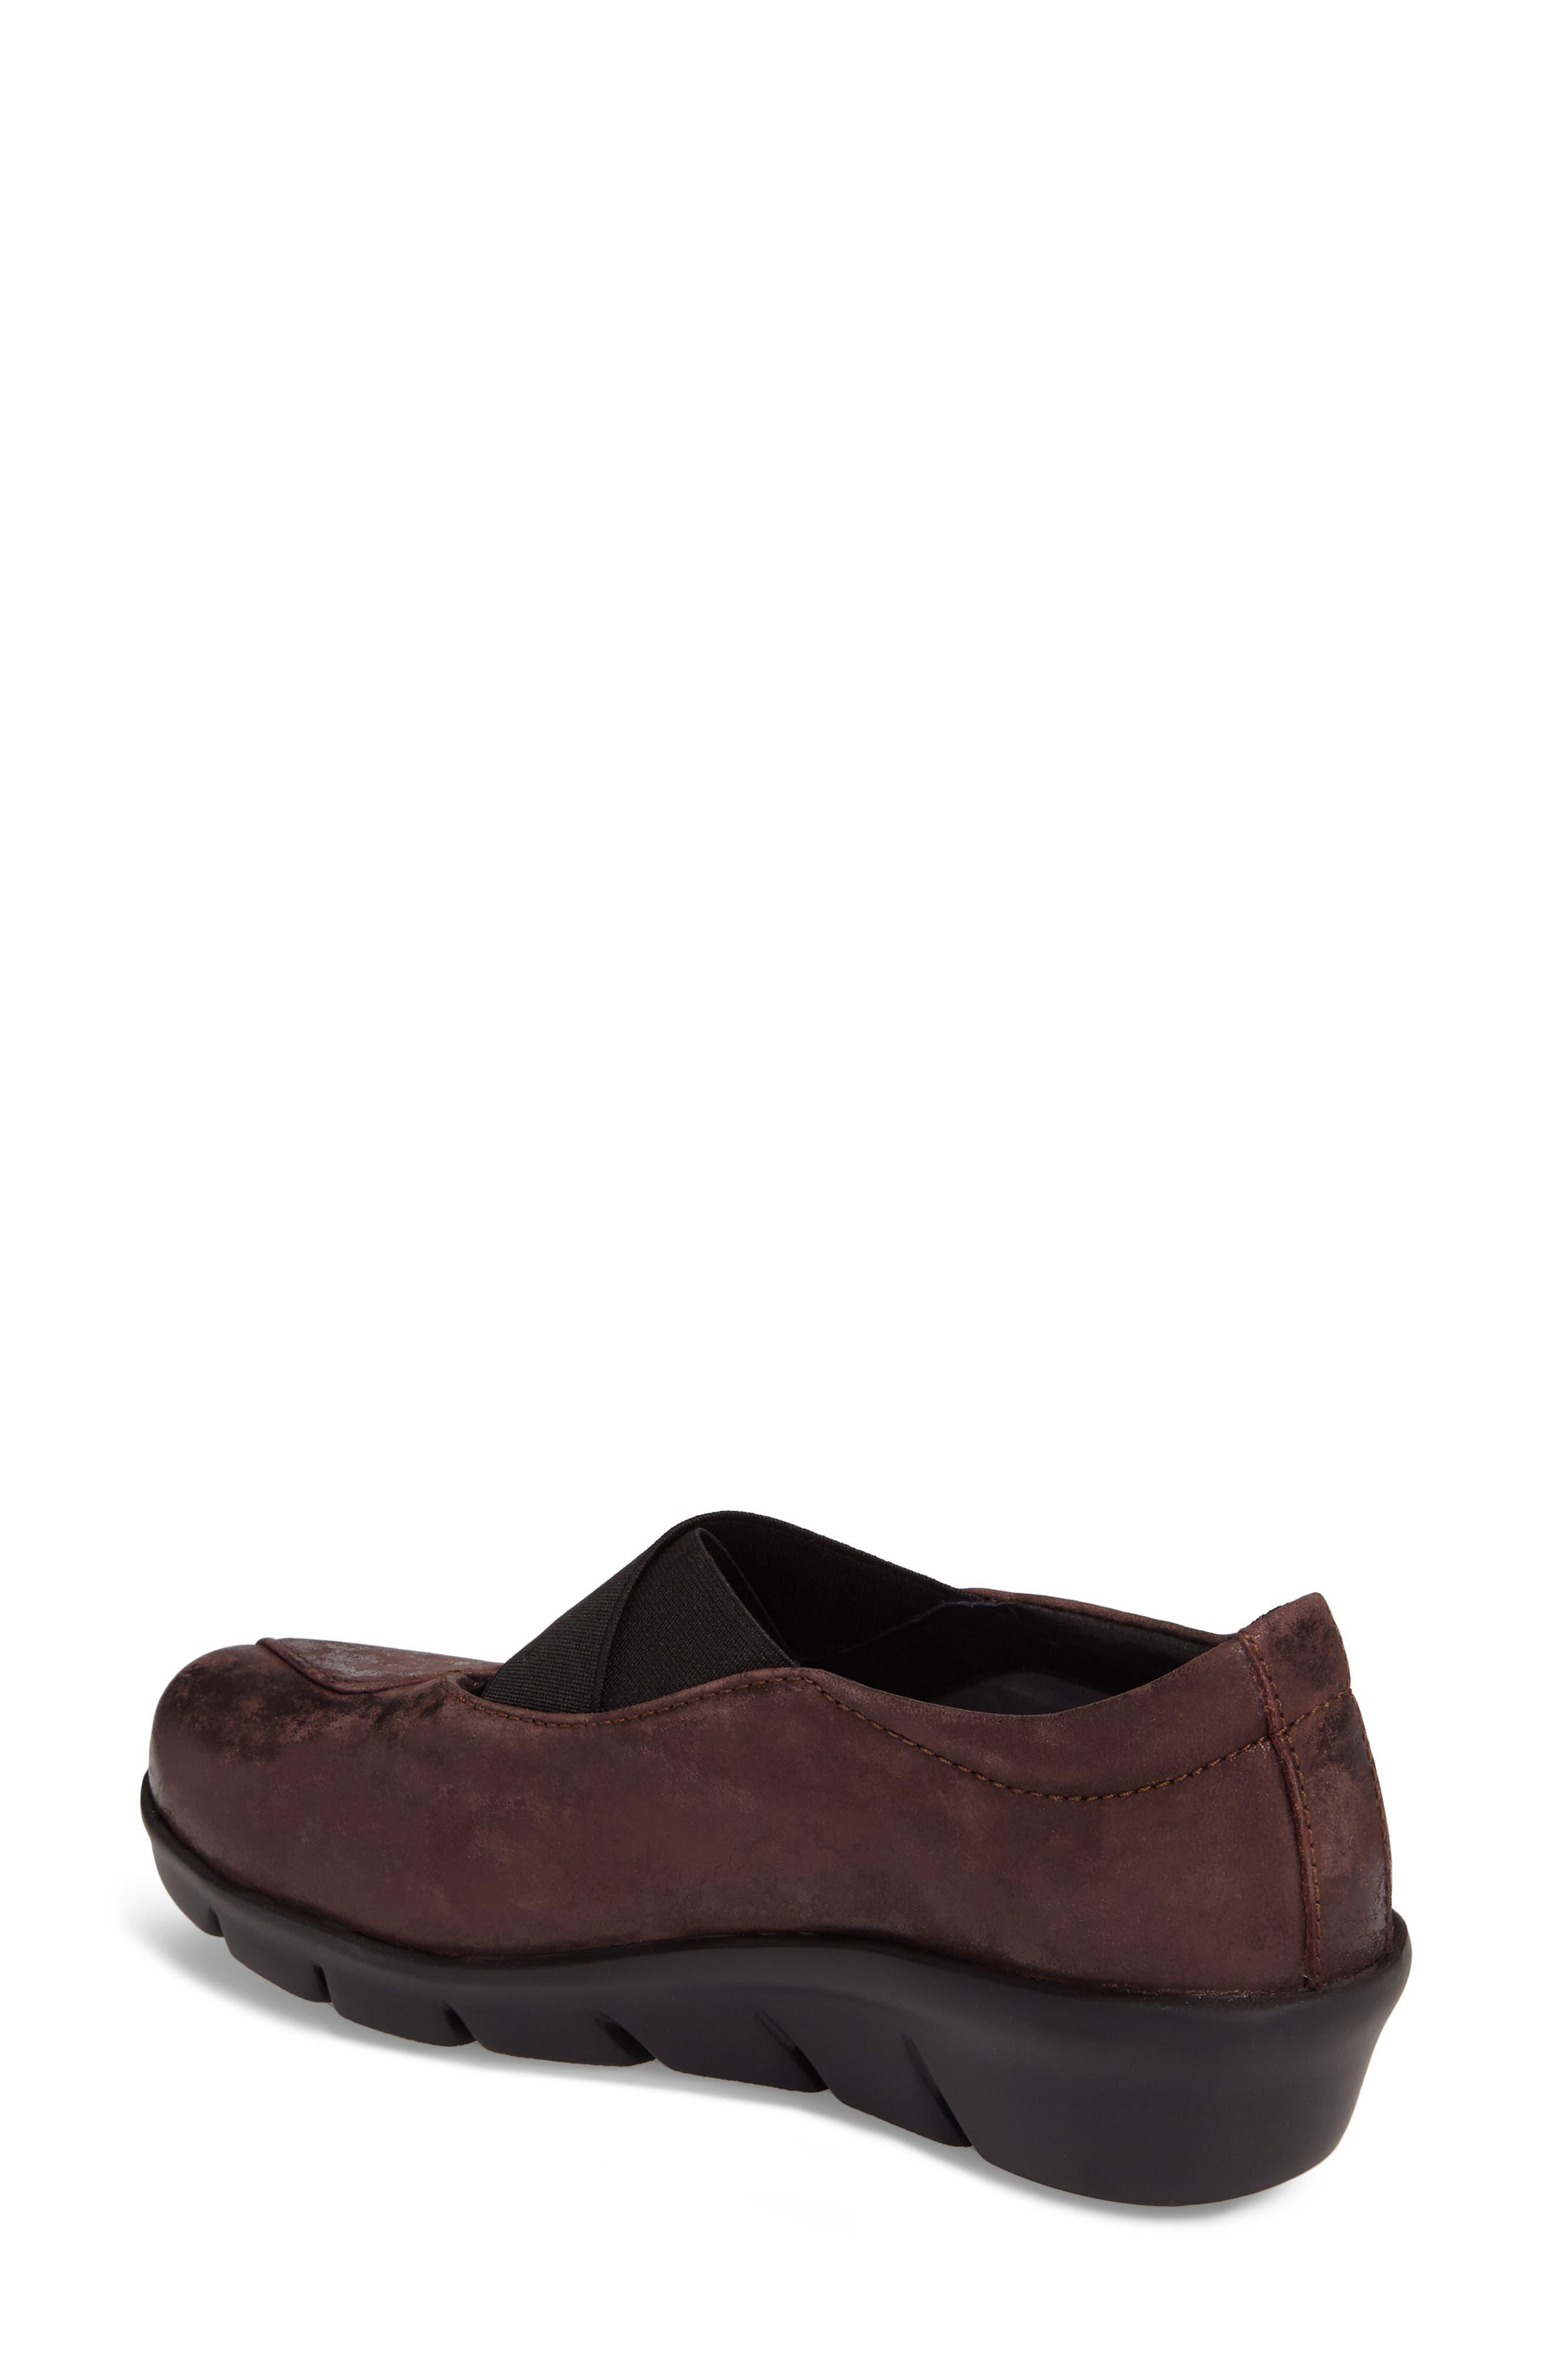 Cursa Slip-On Sneaker,                             Alternate thumbnail 2, color,                             Mocha Leather